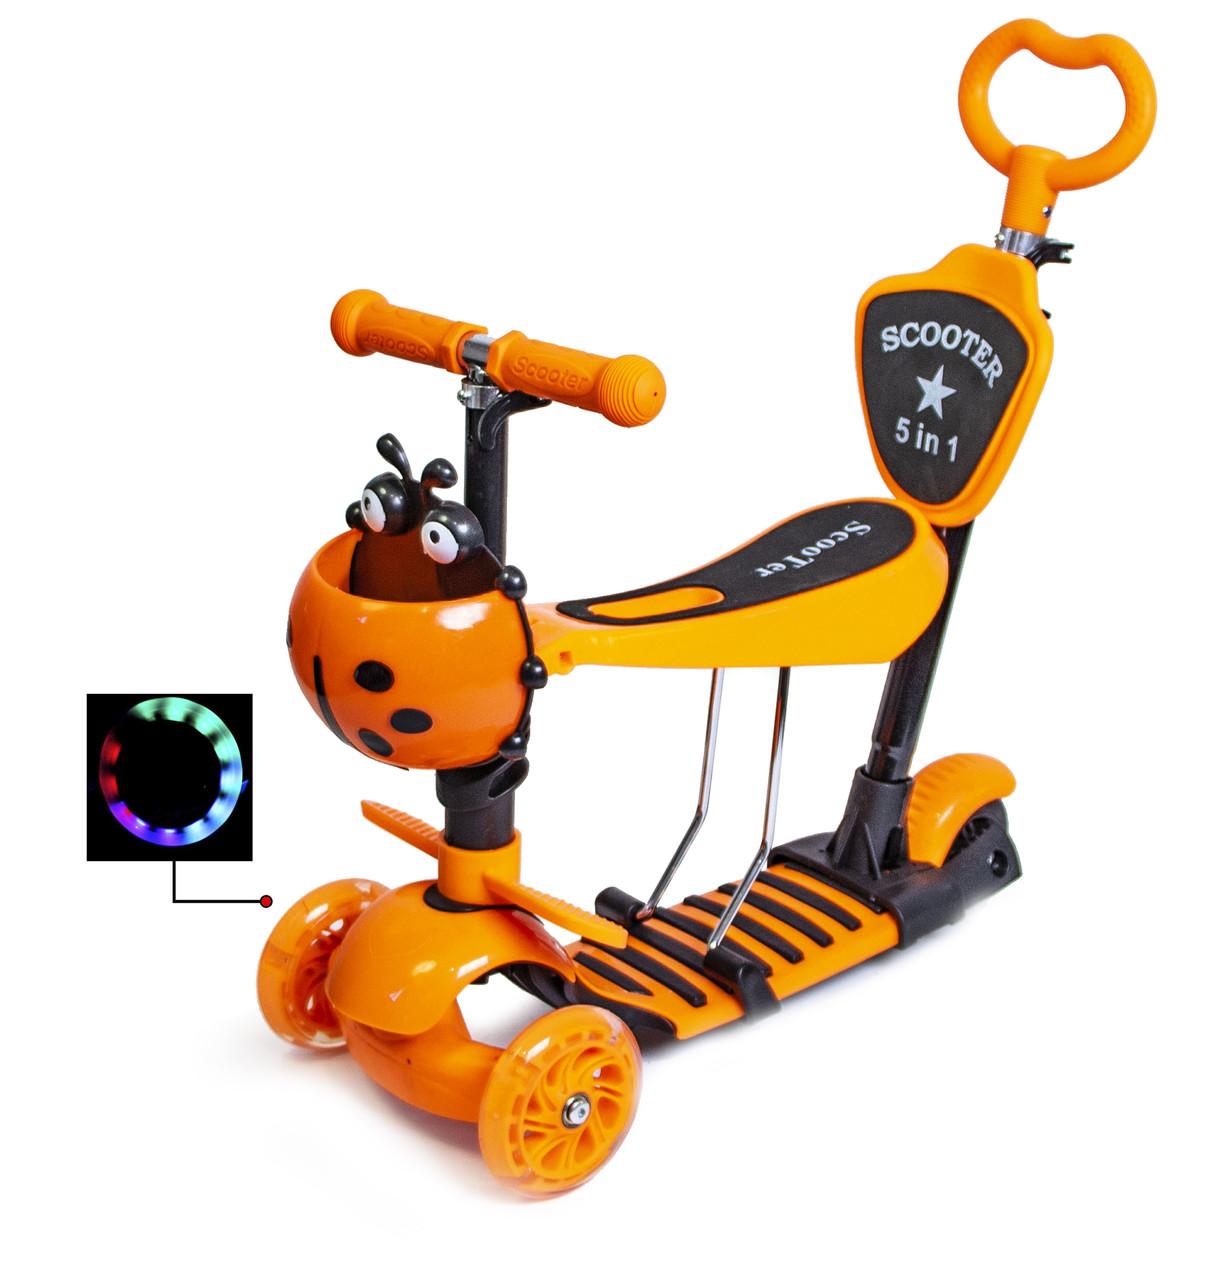 "+Подарок Самокат Scooter ""Божья коровка"" 5in1 Orange"